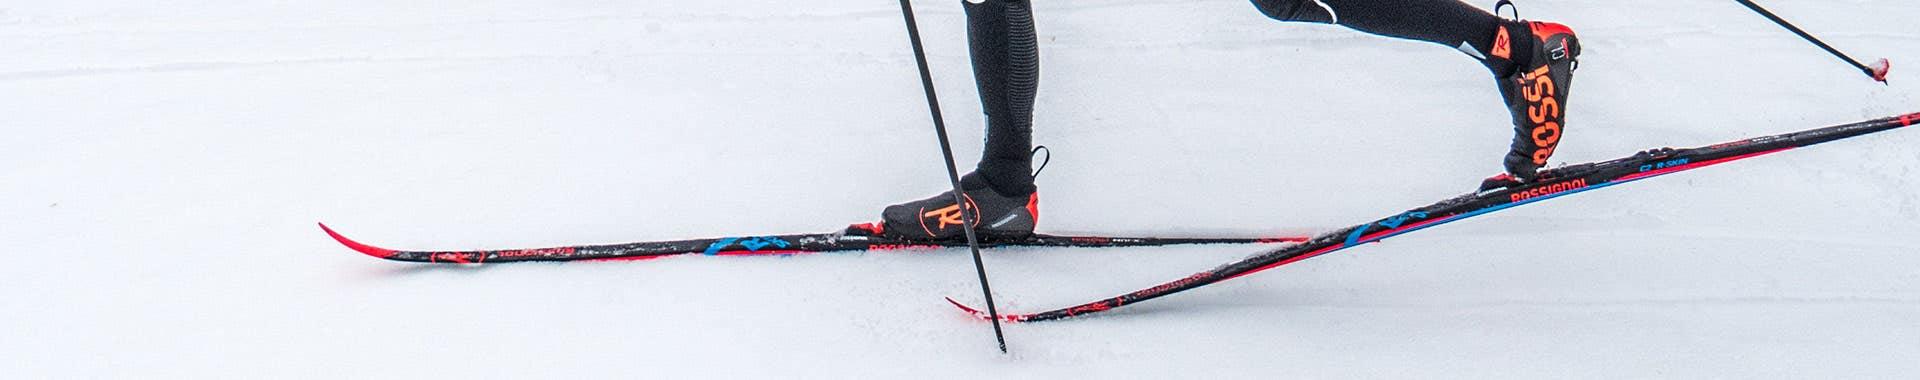 Classic skis